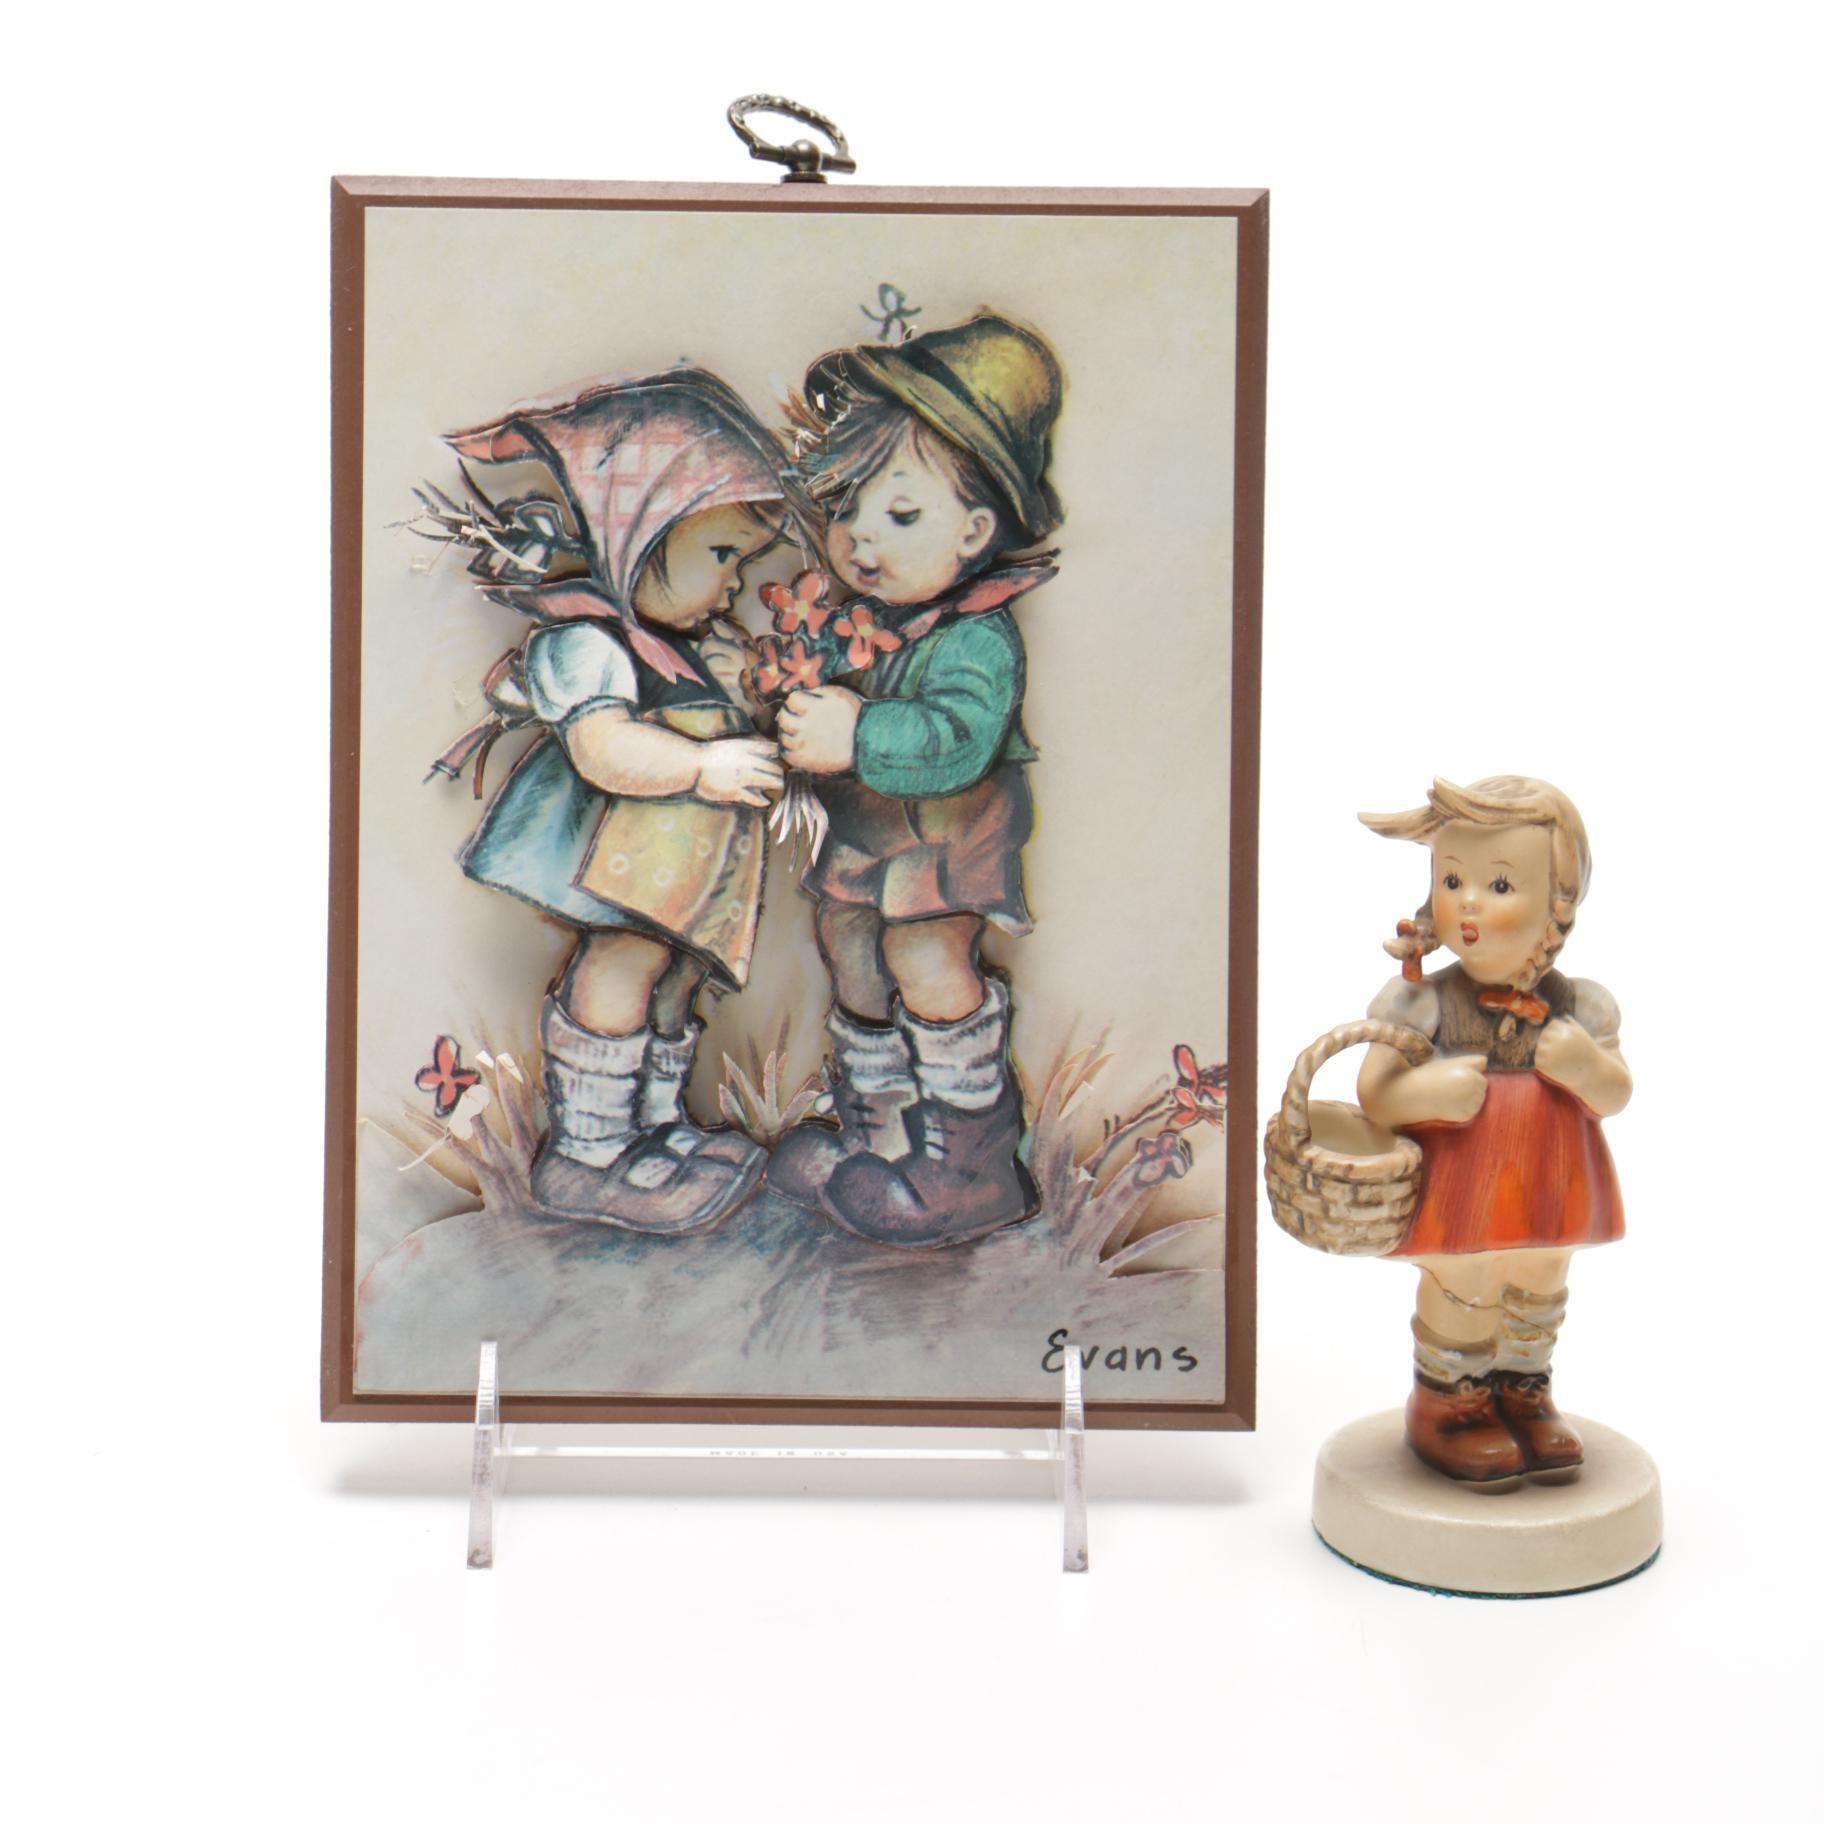 Hummel Figurine and Portrait